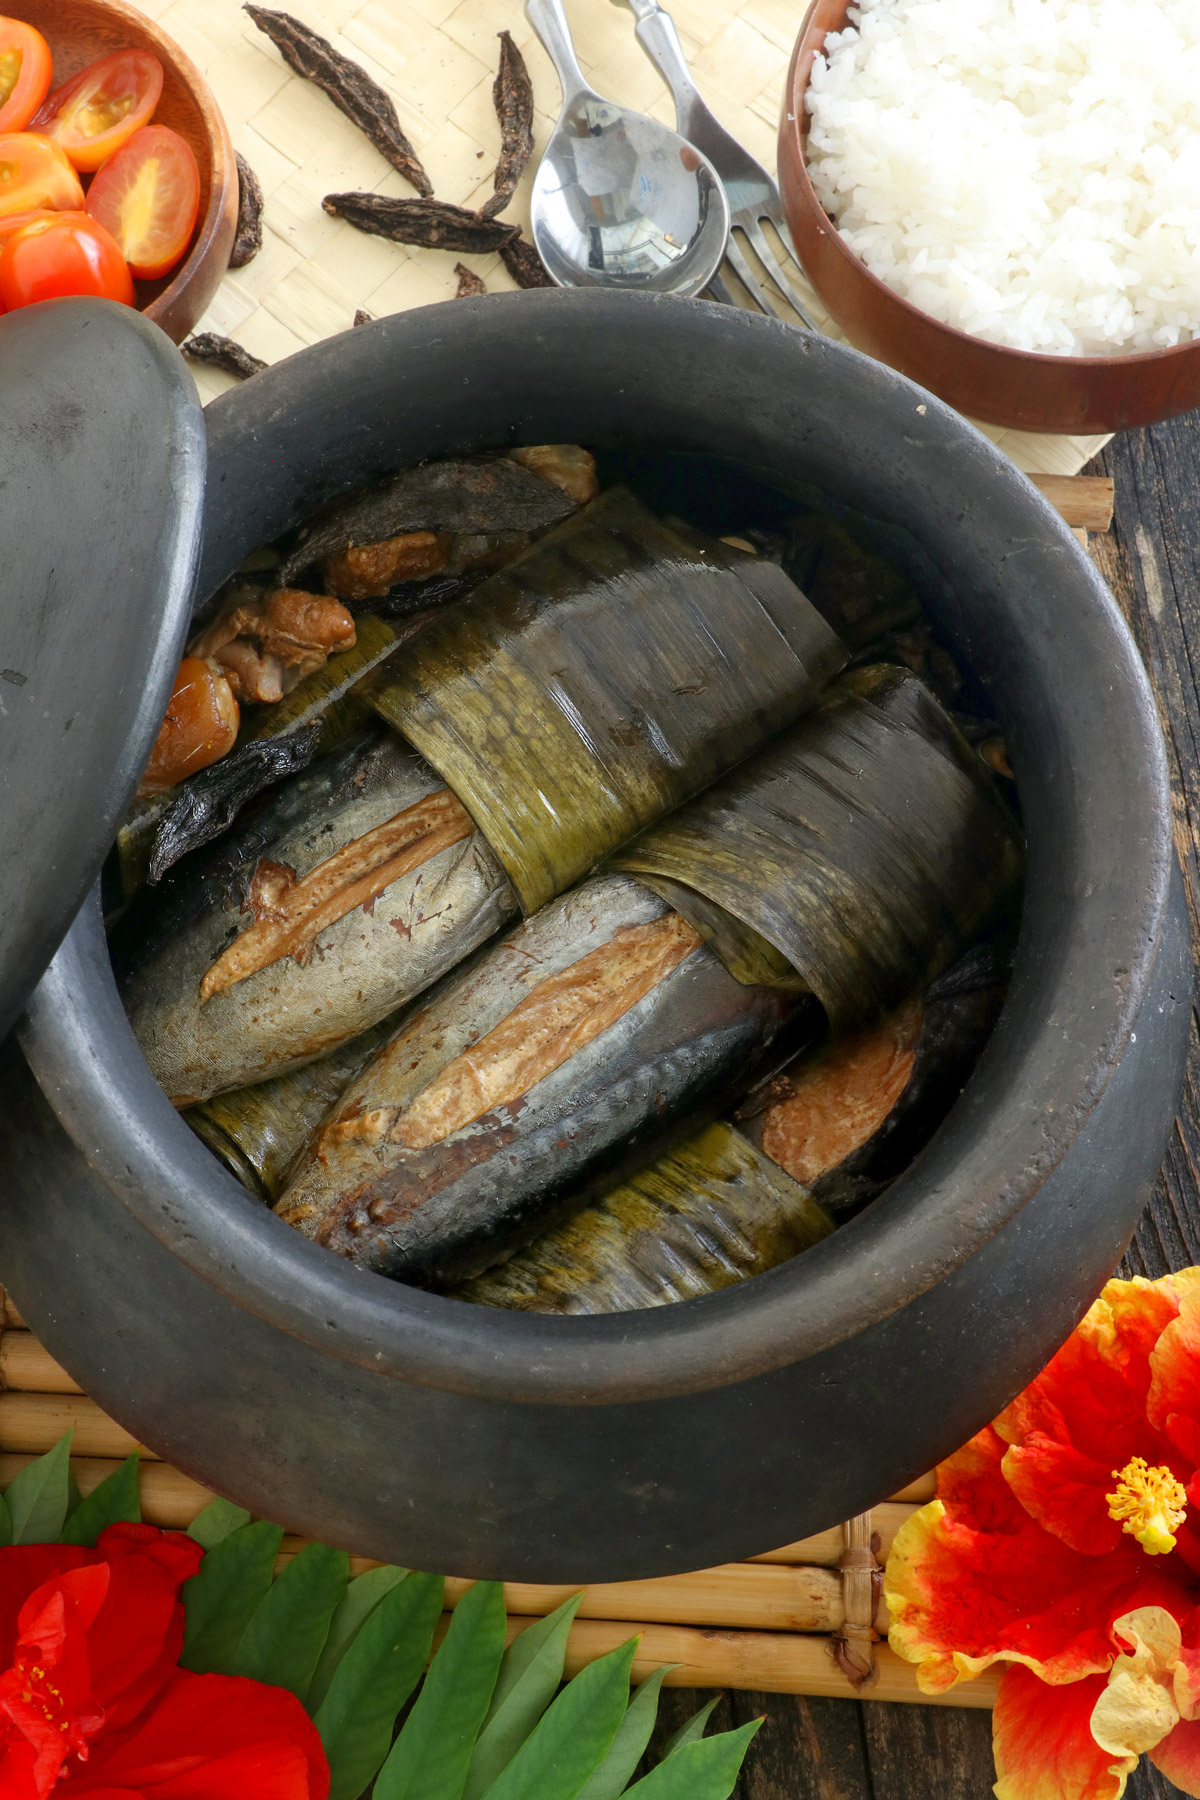 Sinaing na Tulingan cooked in a claypot